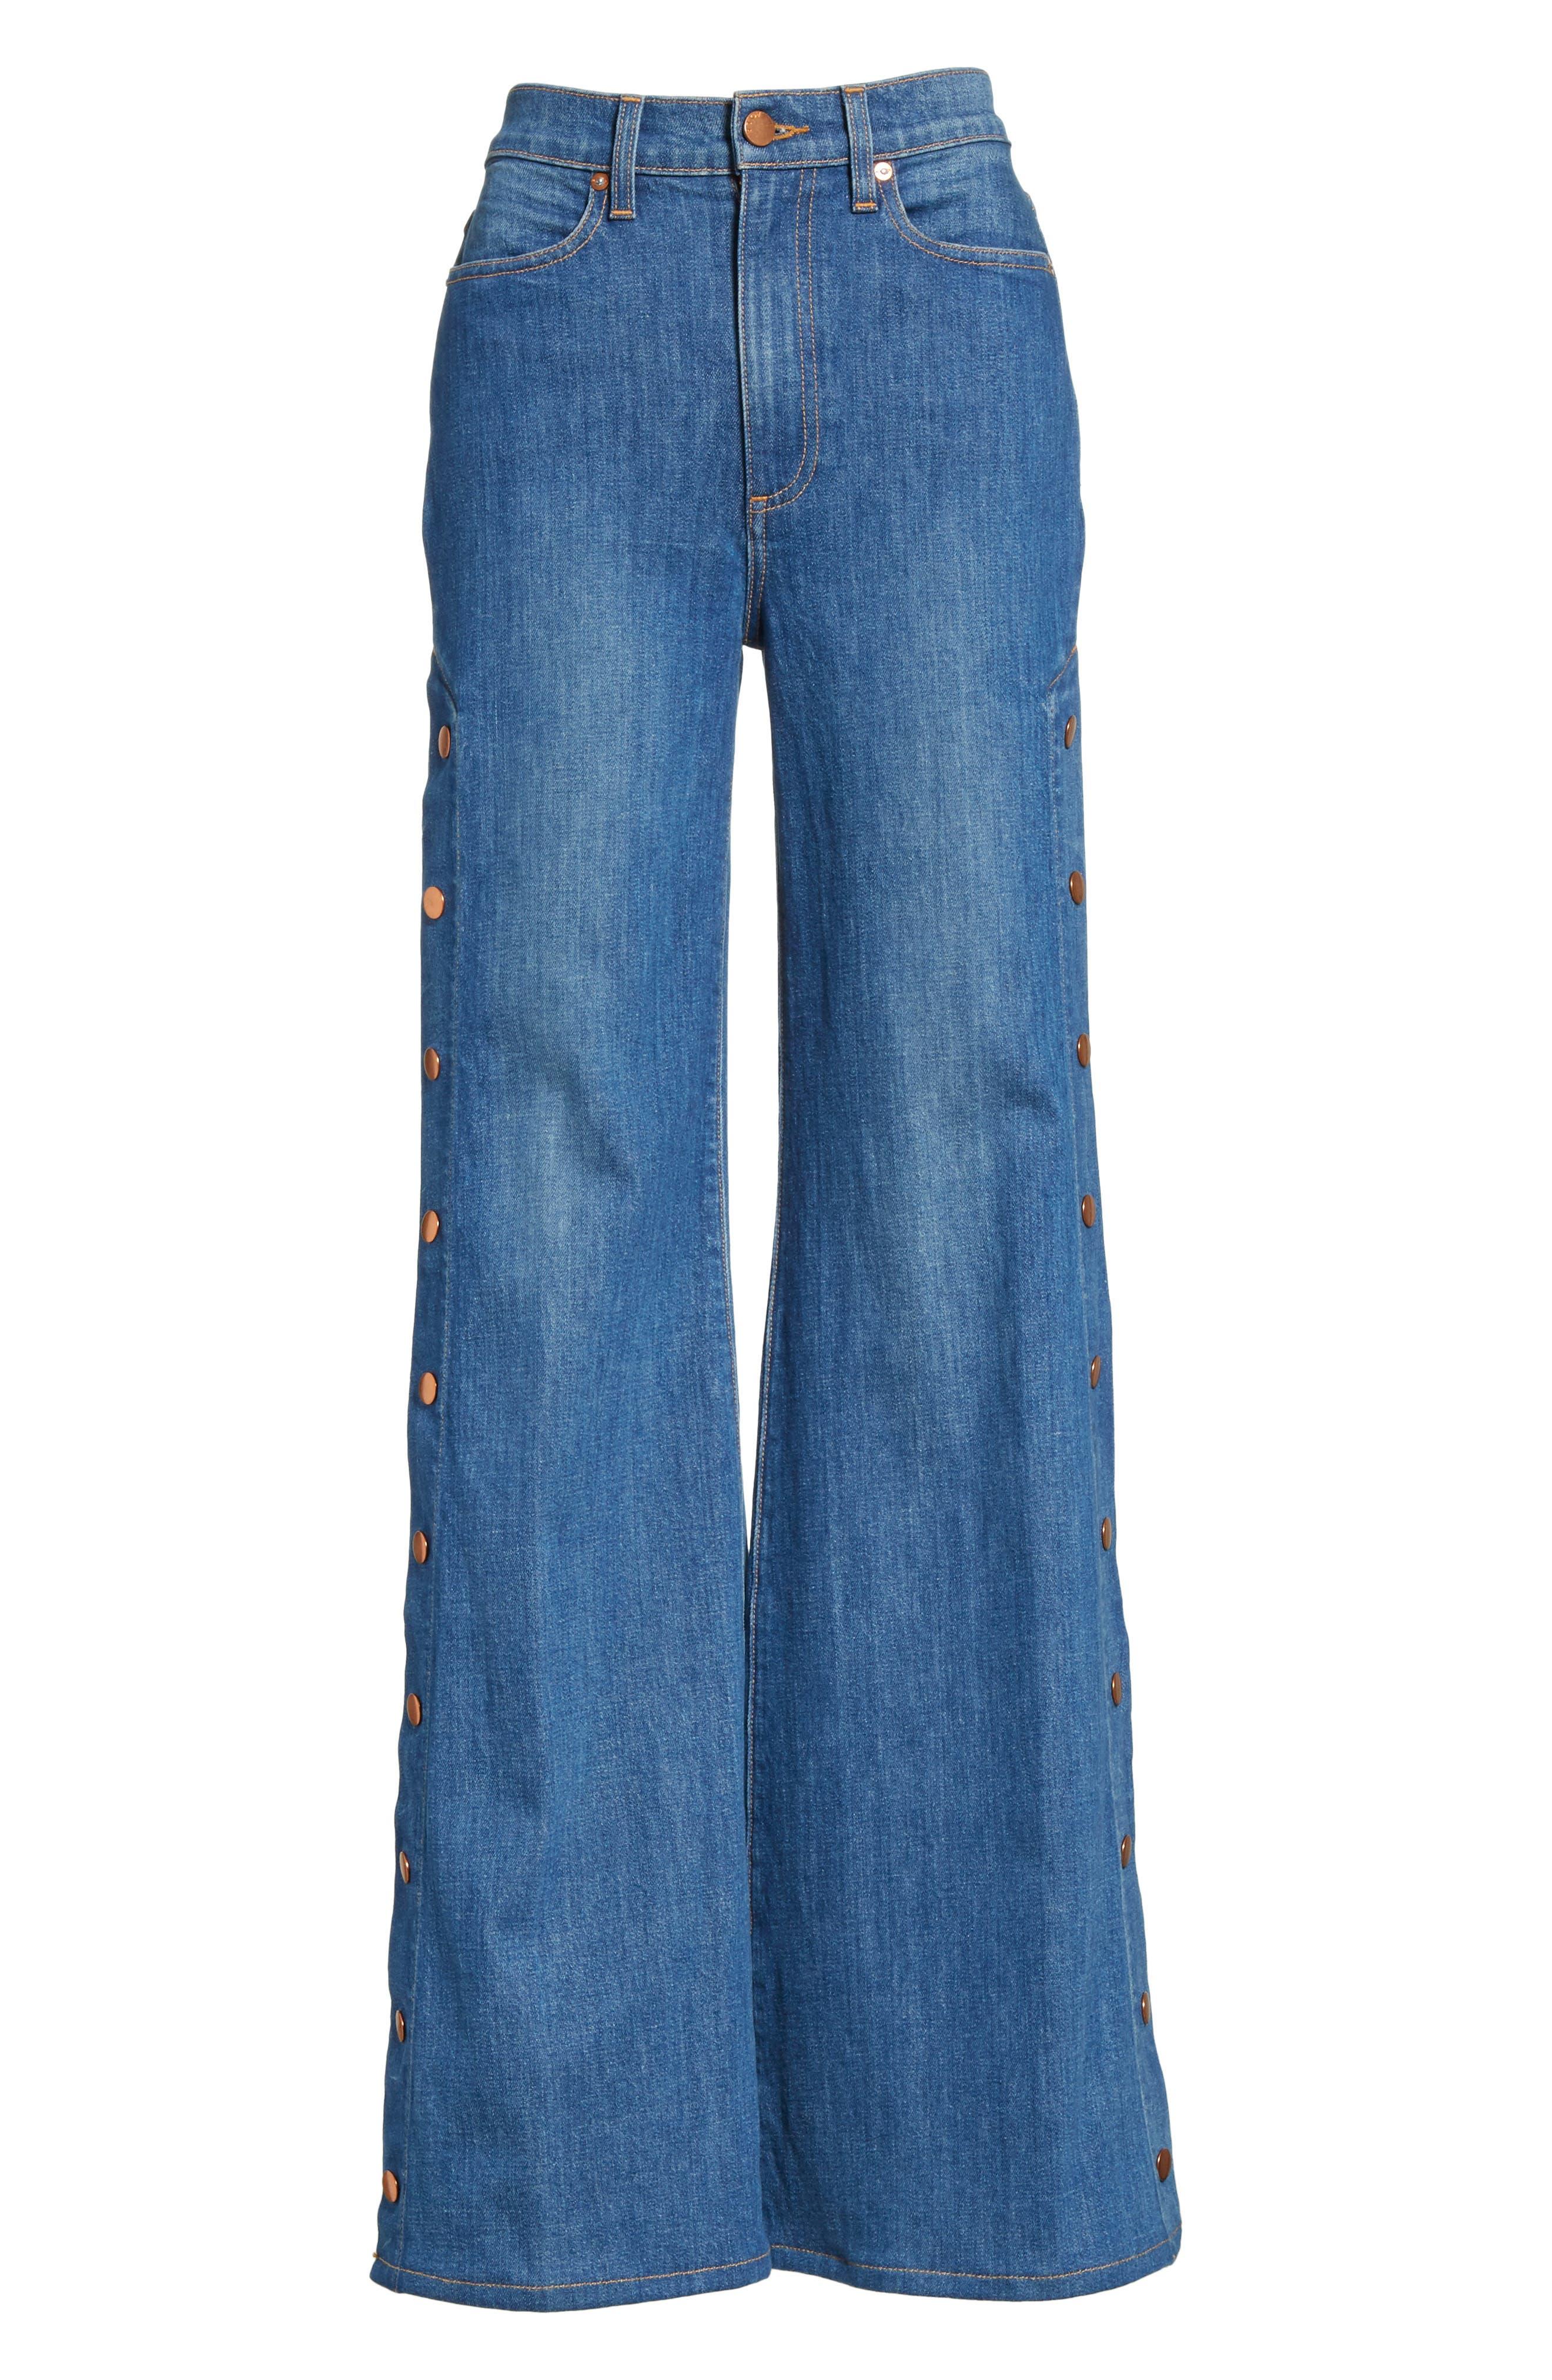 AO.LA Gorgeous Snap Side Flare Leg Jeans,                             Alternate thumbnail 6, color,                             French Blue